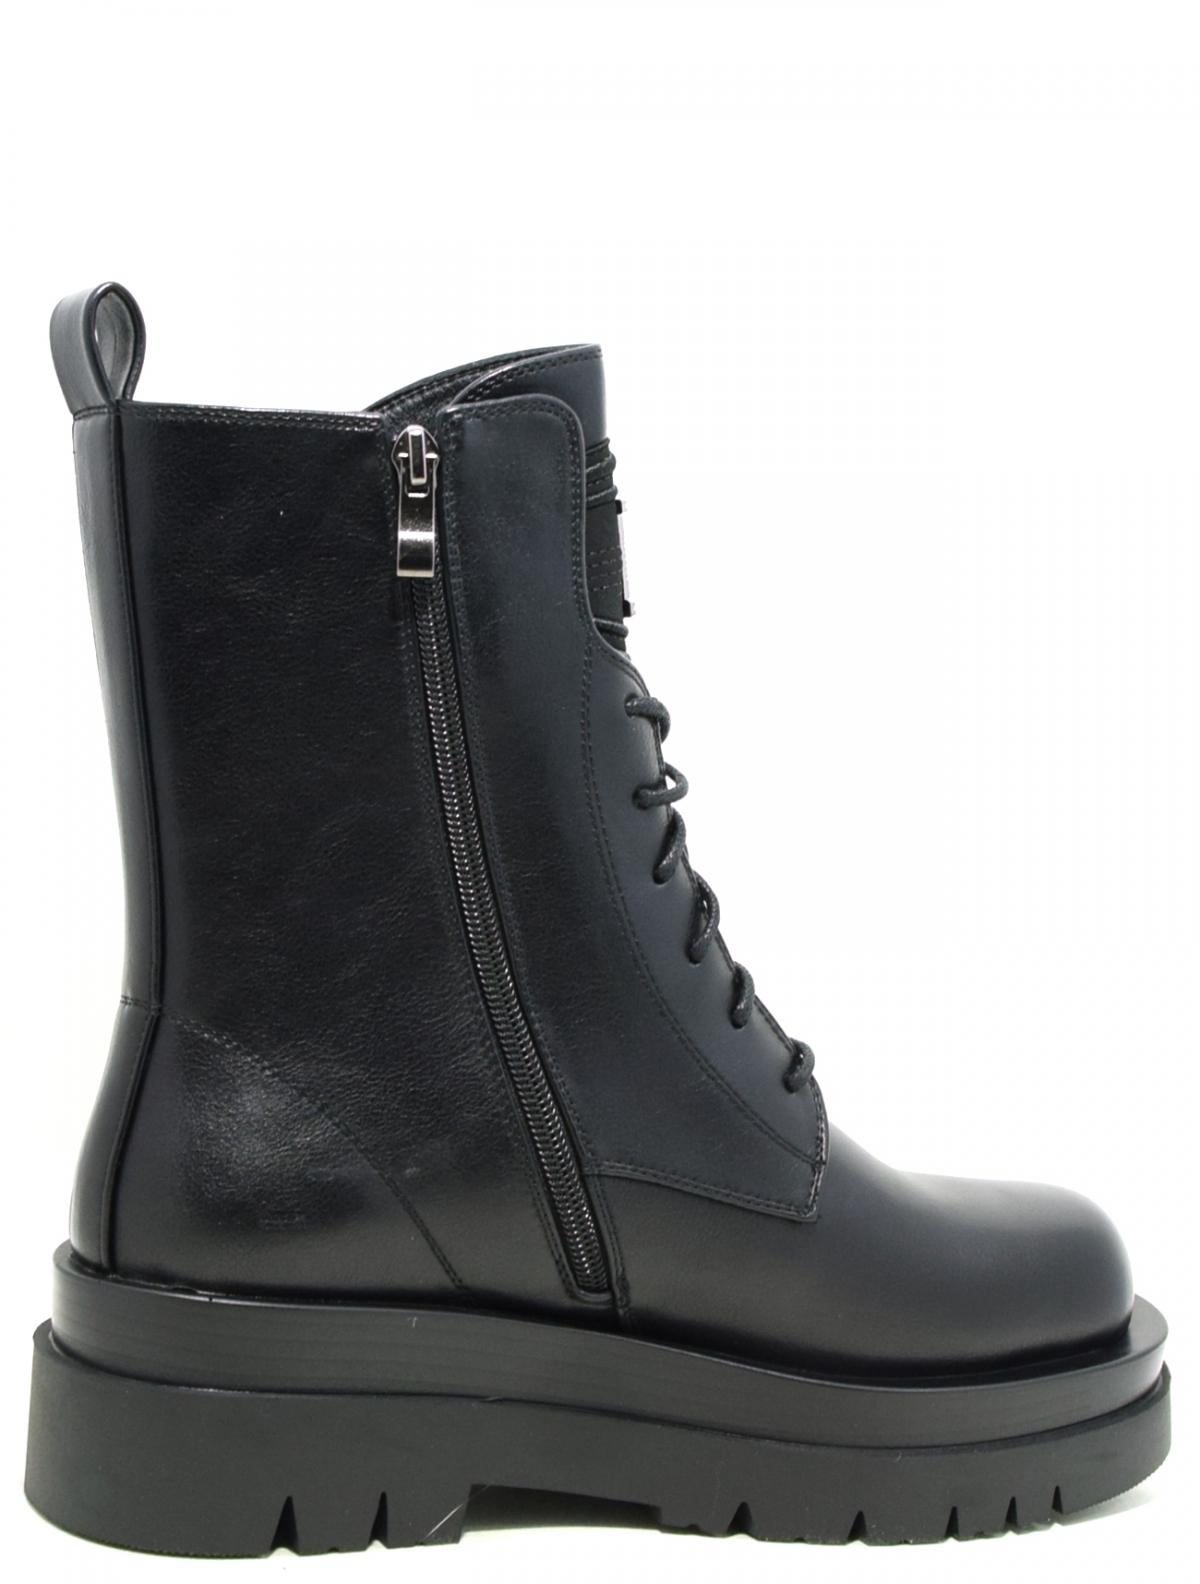 Admlis H957 женские ботинки